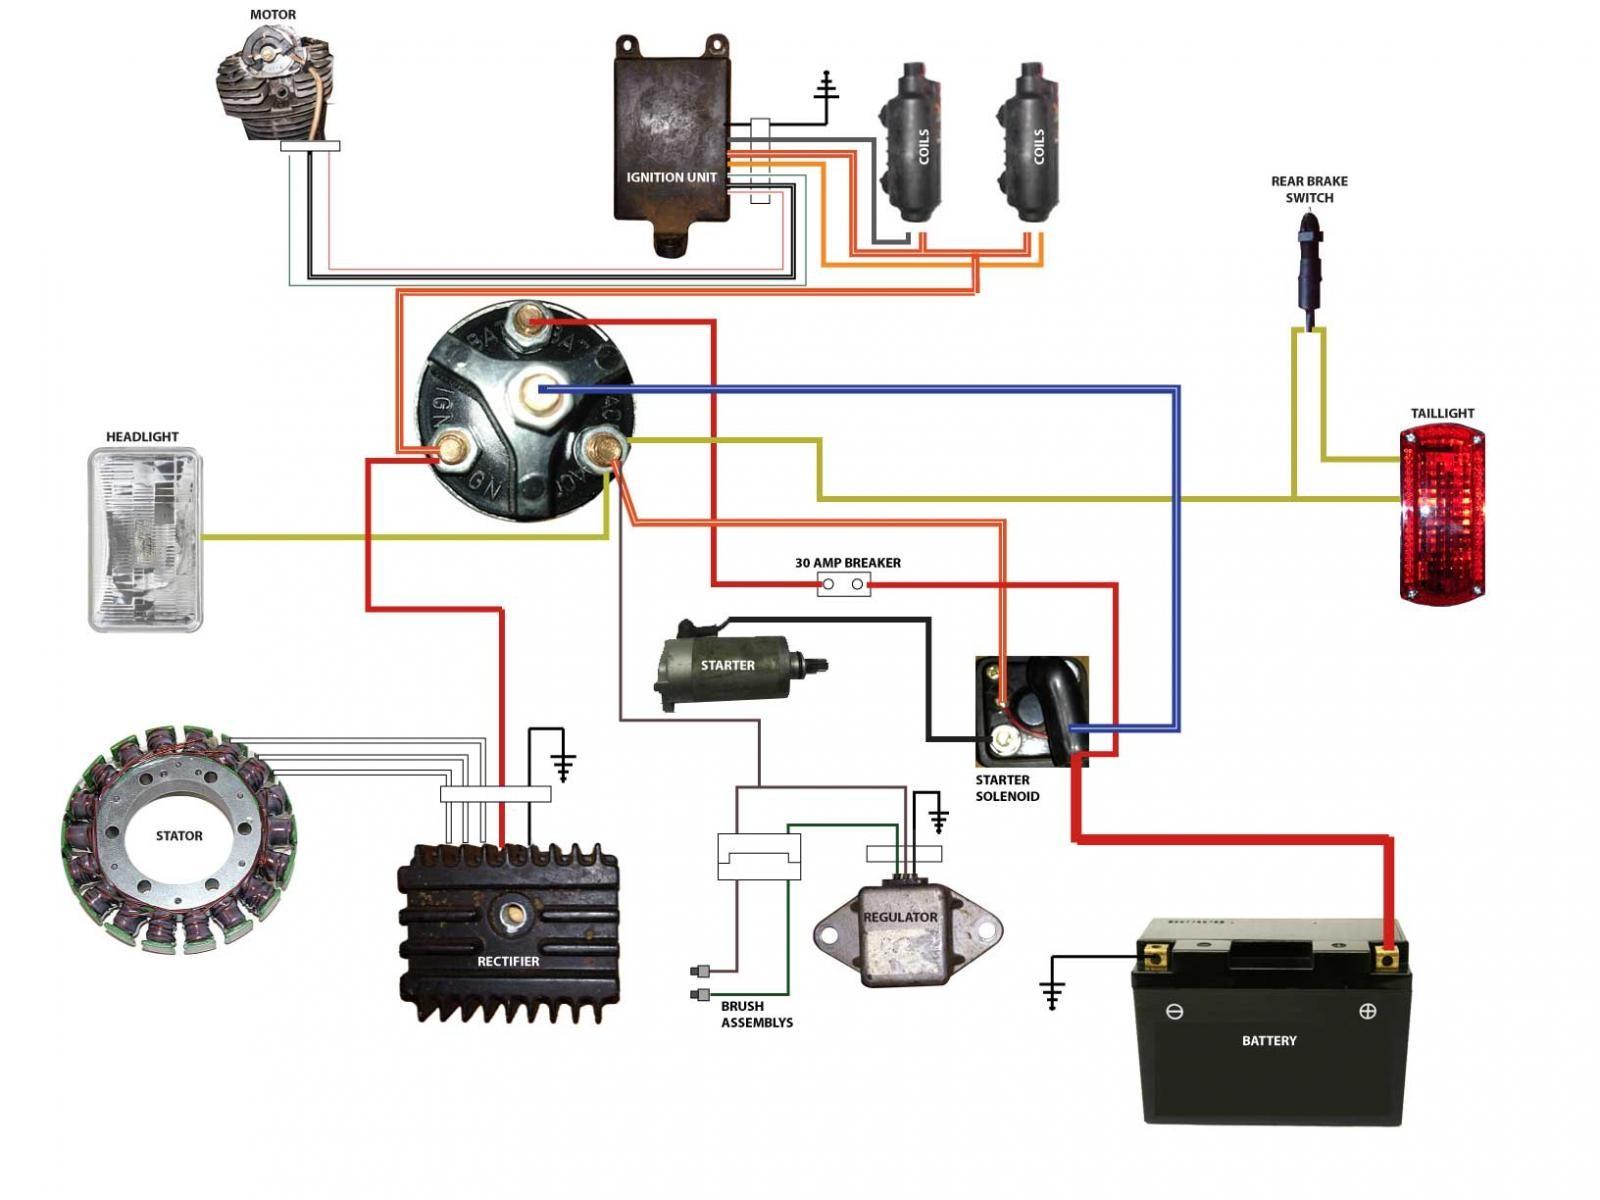 Wiring Diagram Cb 750 Bobber 1975 Honda Cb750 Parts Diagram Wire Simple  Wiring For Honda Bobber Cb750 Chopper Wiring Diagram 750